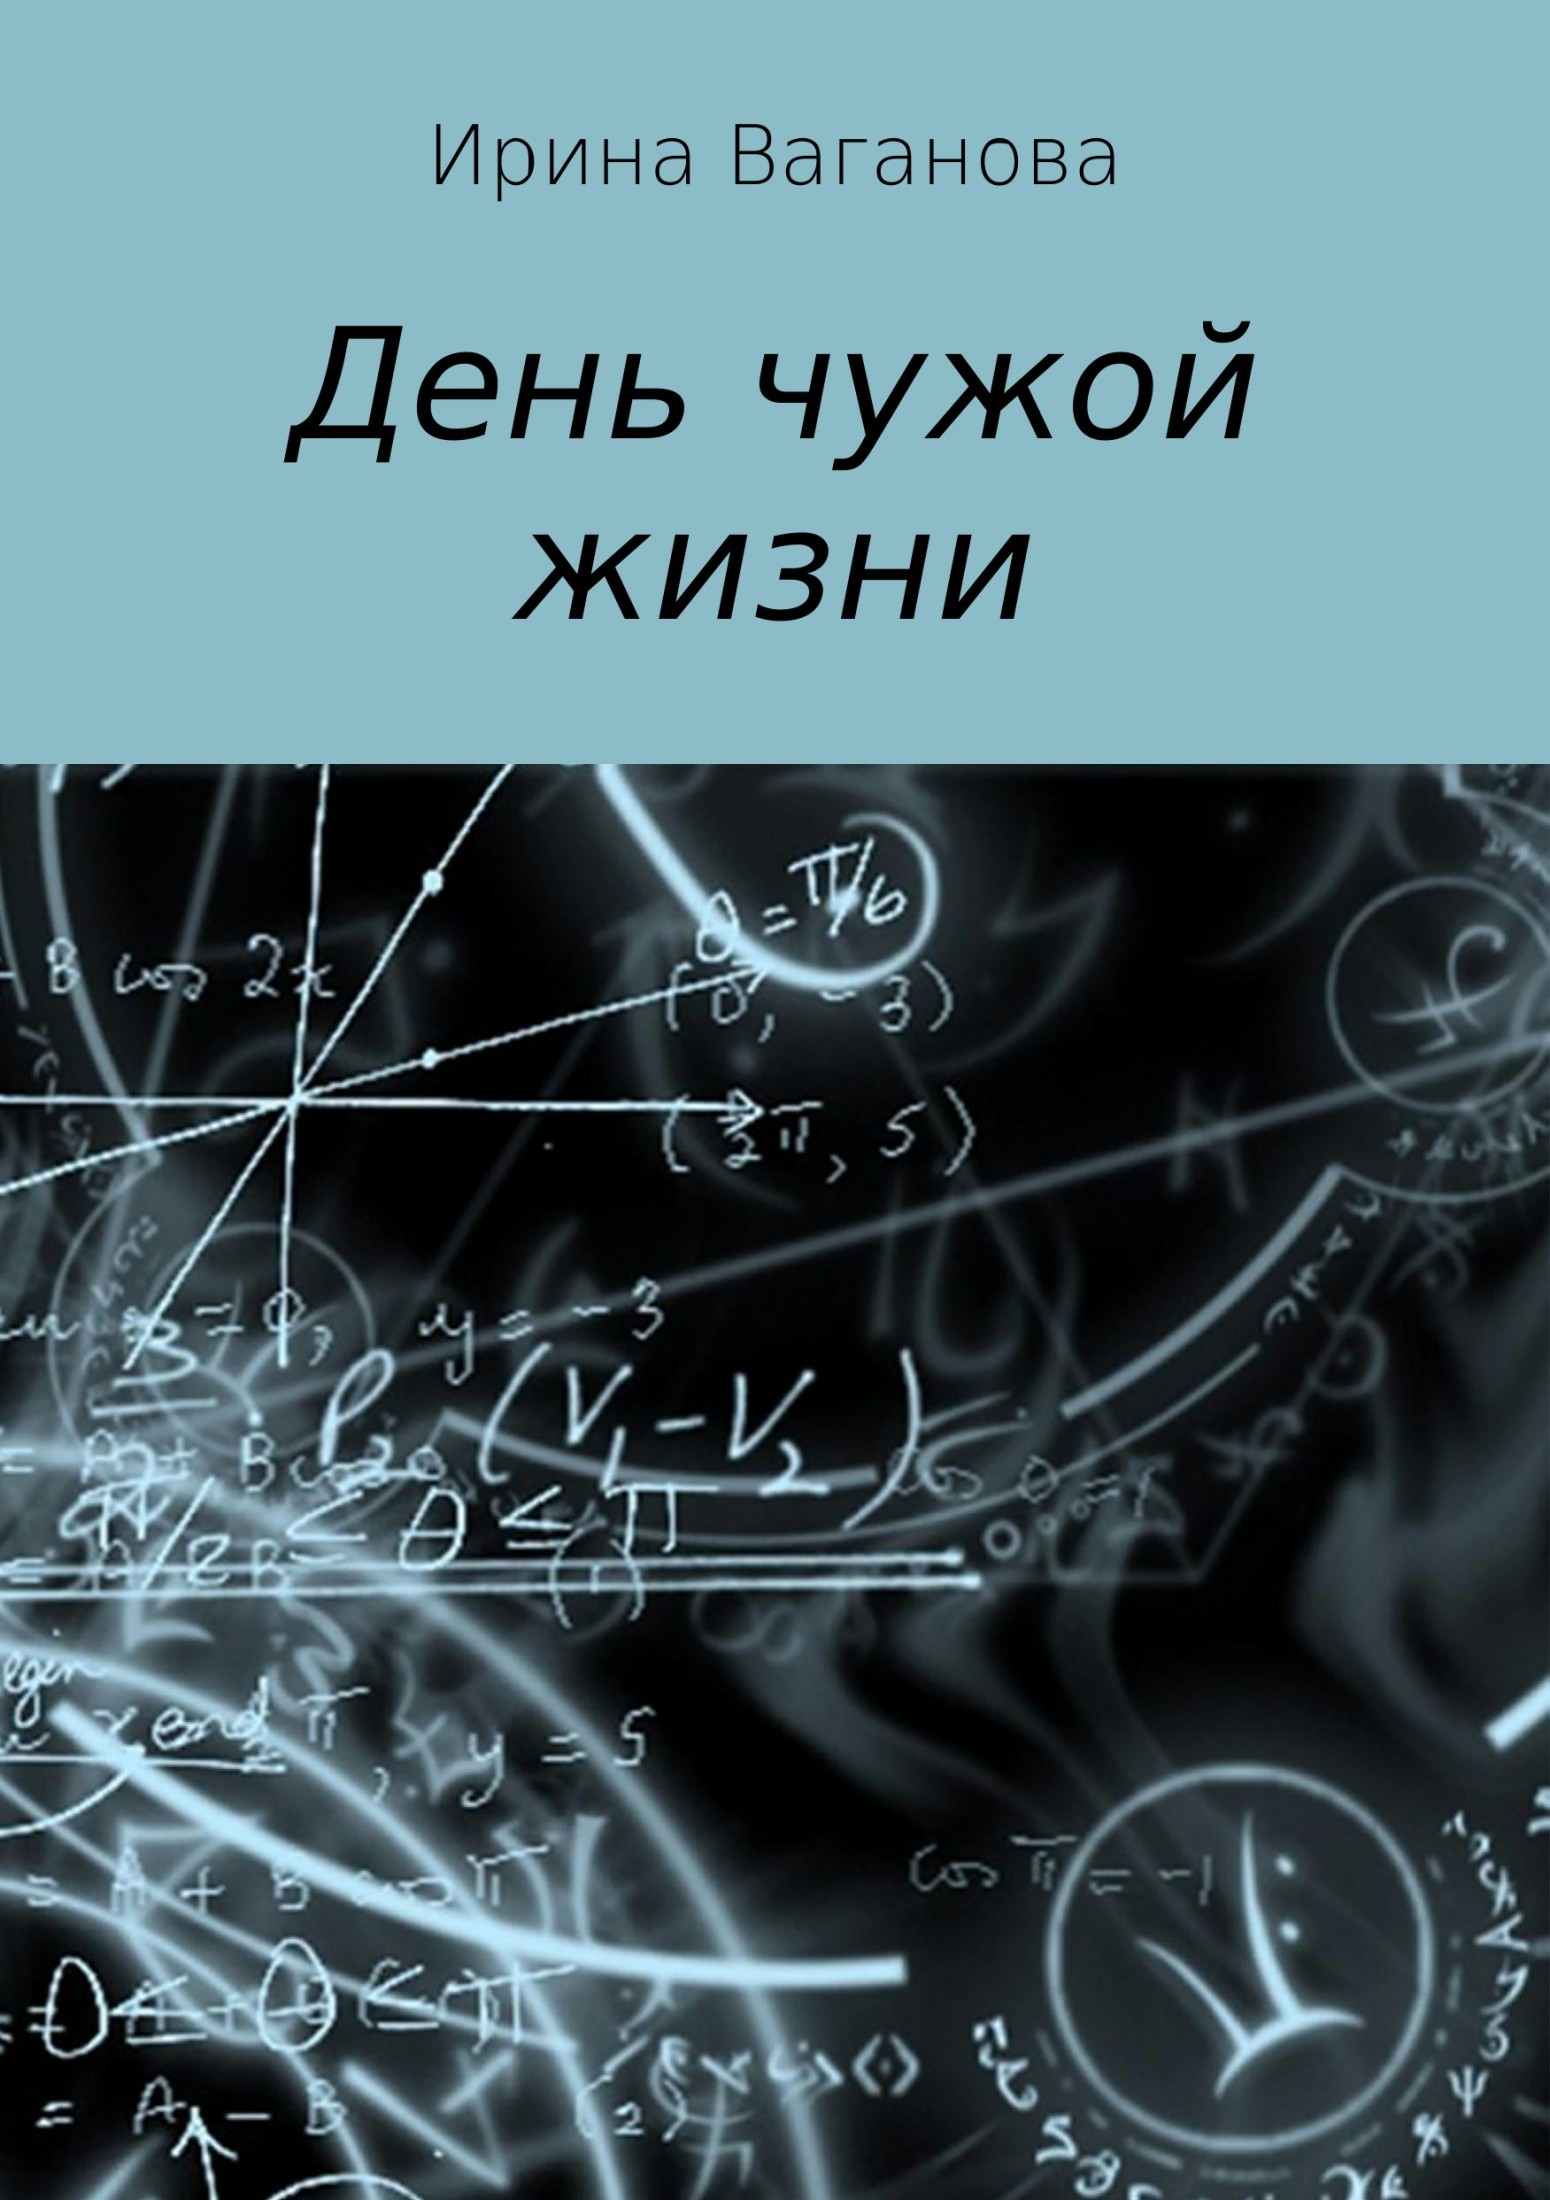 Ирина Ваганова бесплатно